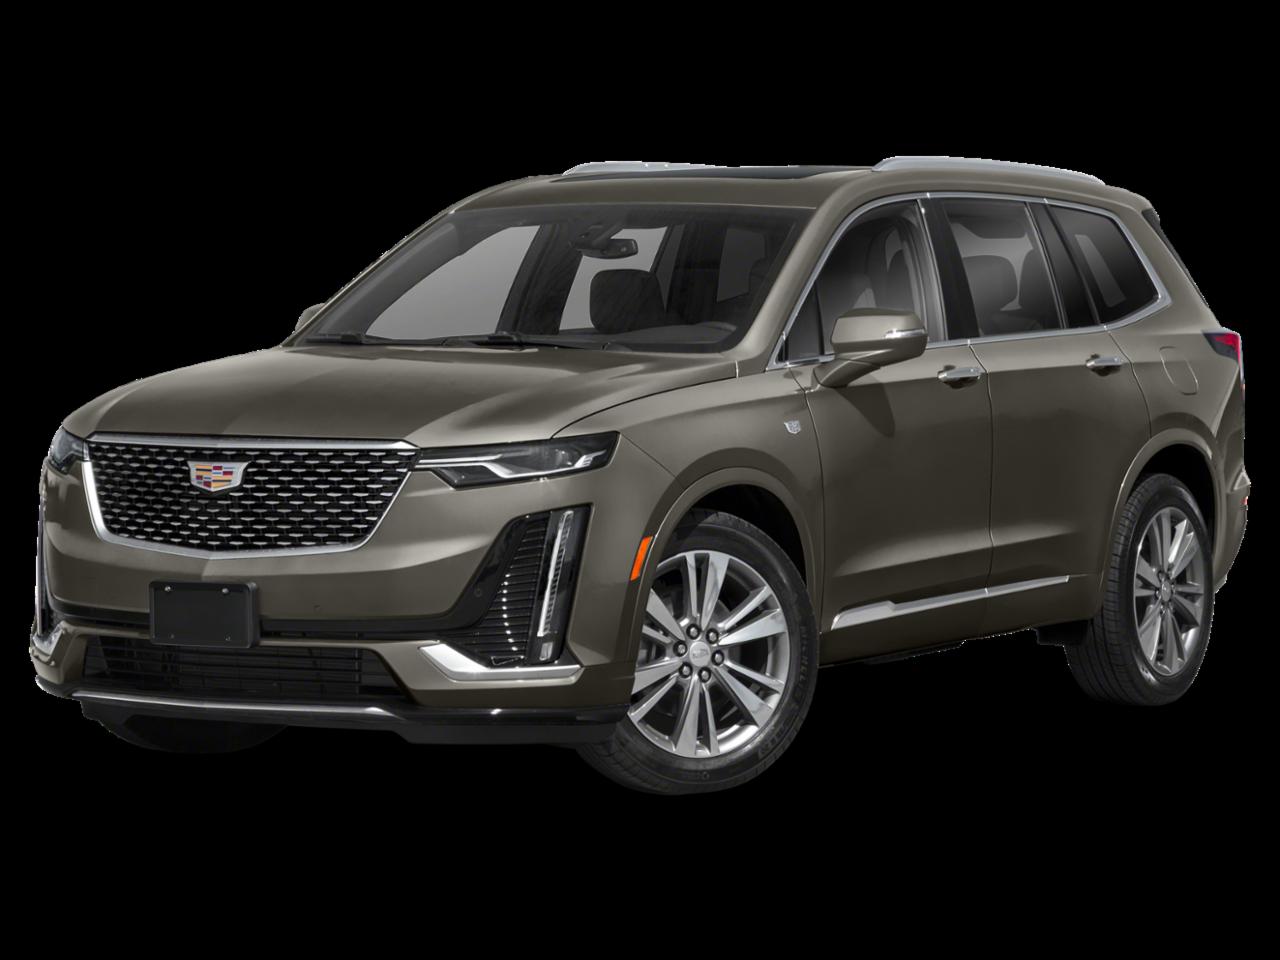 Cadillac 2022 XT6 Luxury